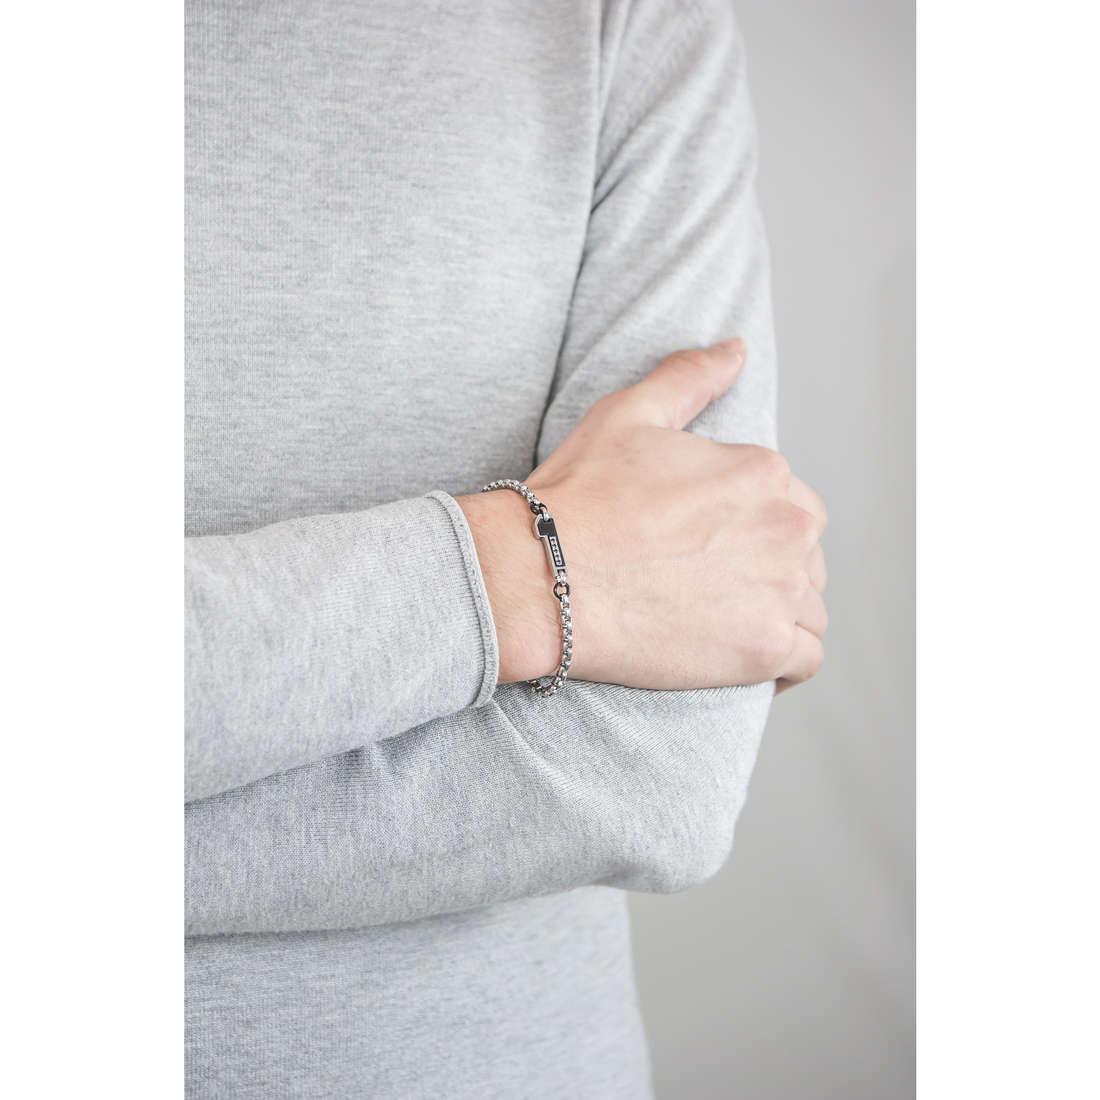 Luca Barra bracciali uomo LBBA489 indosso